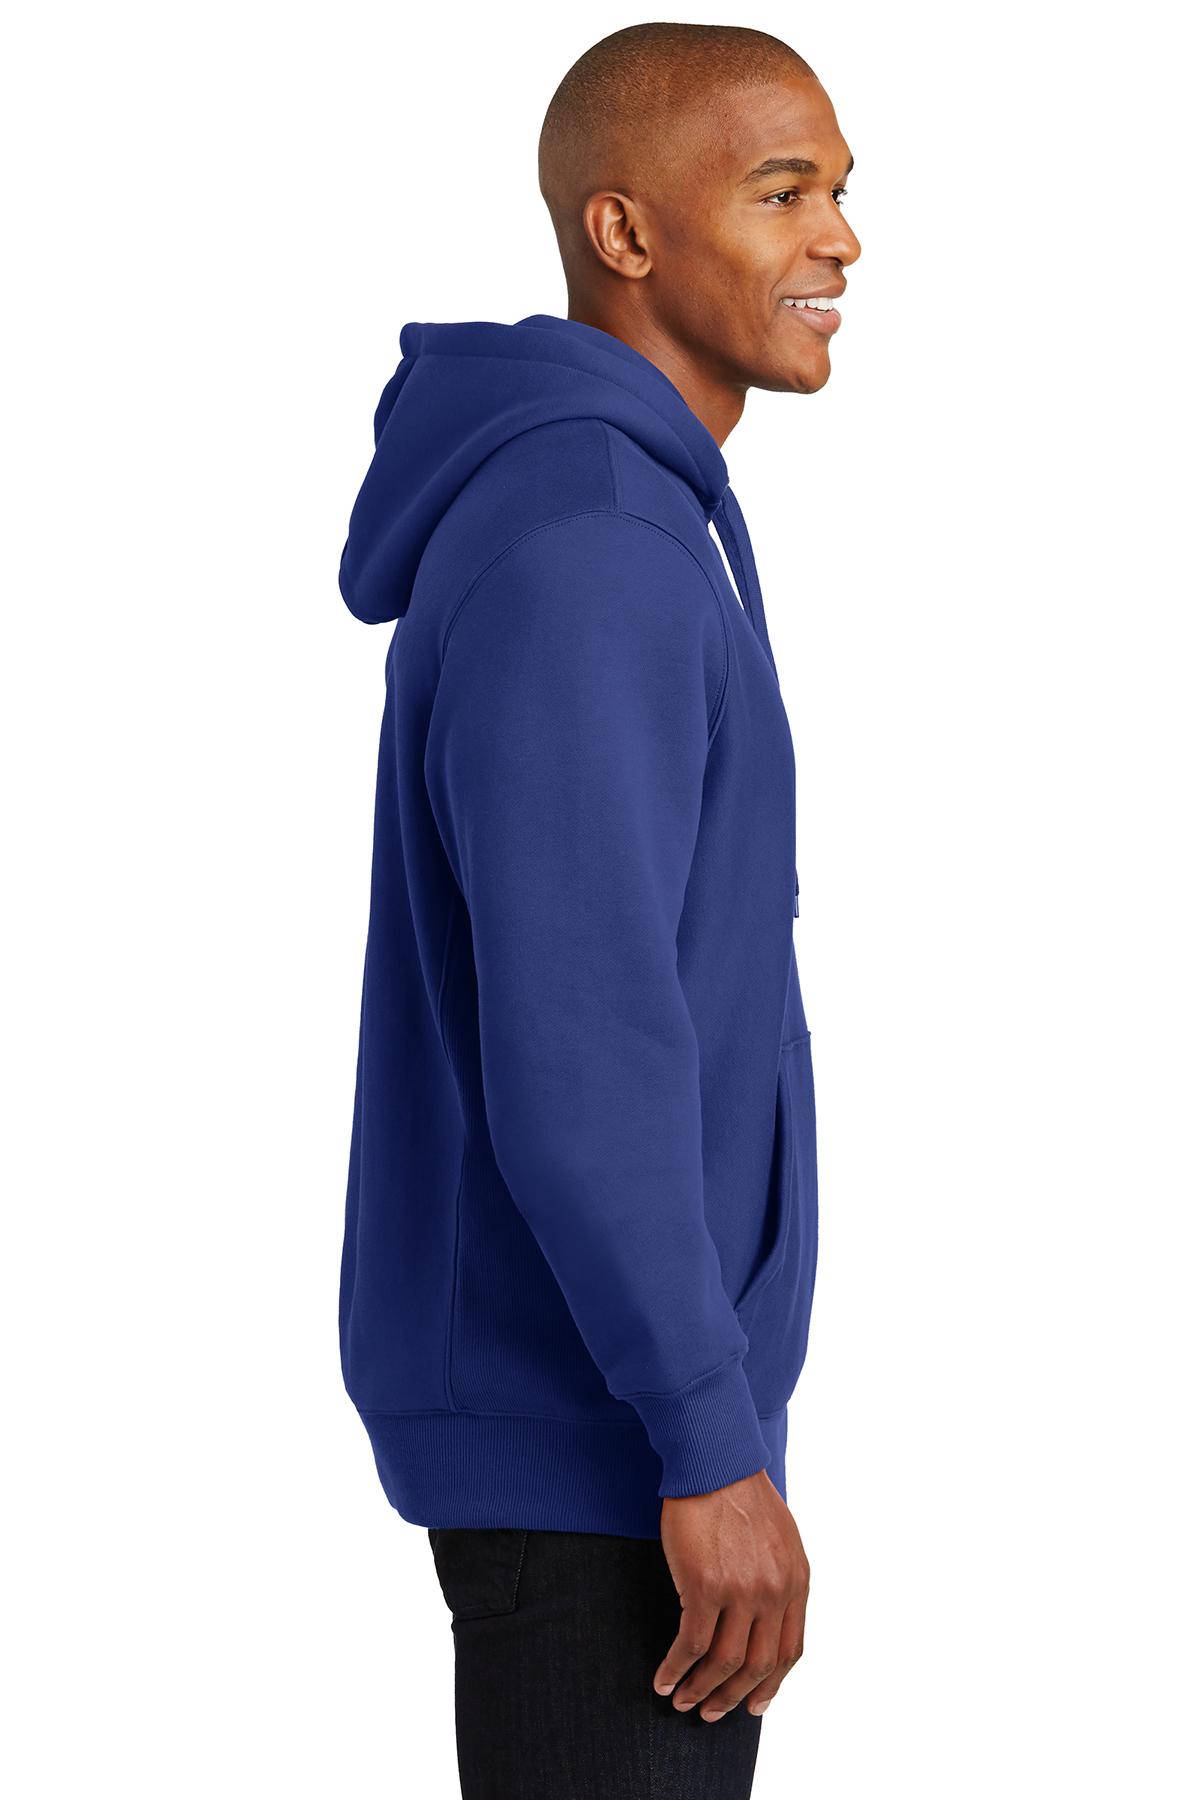 F281 FREE SHIPPING! Sport-Tek Men/'s Heavyweight Pullover Hooded Sweatshirt